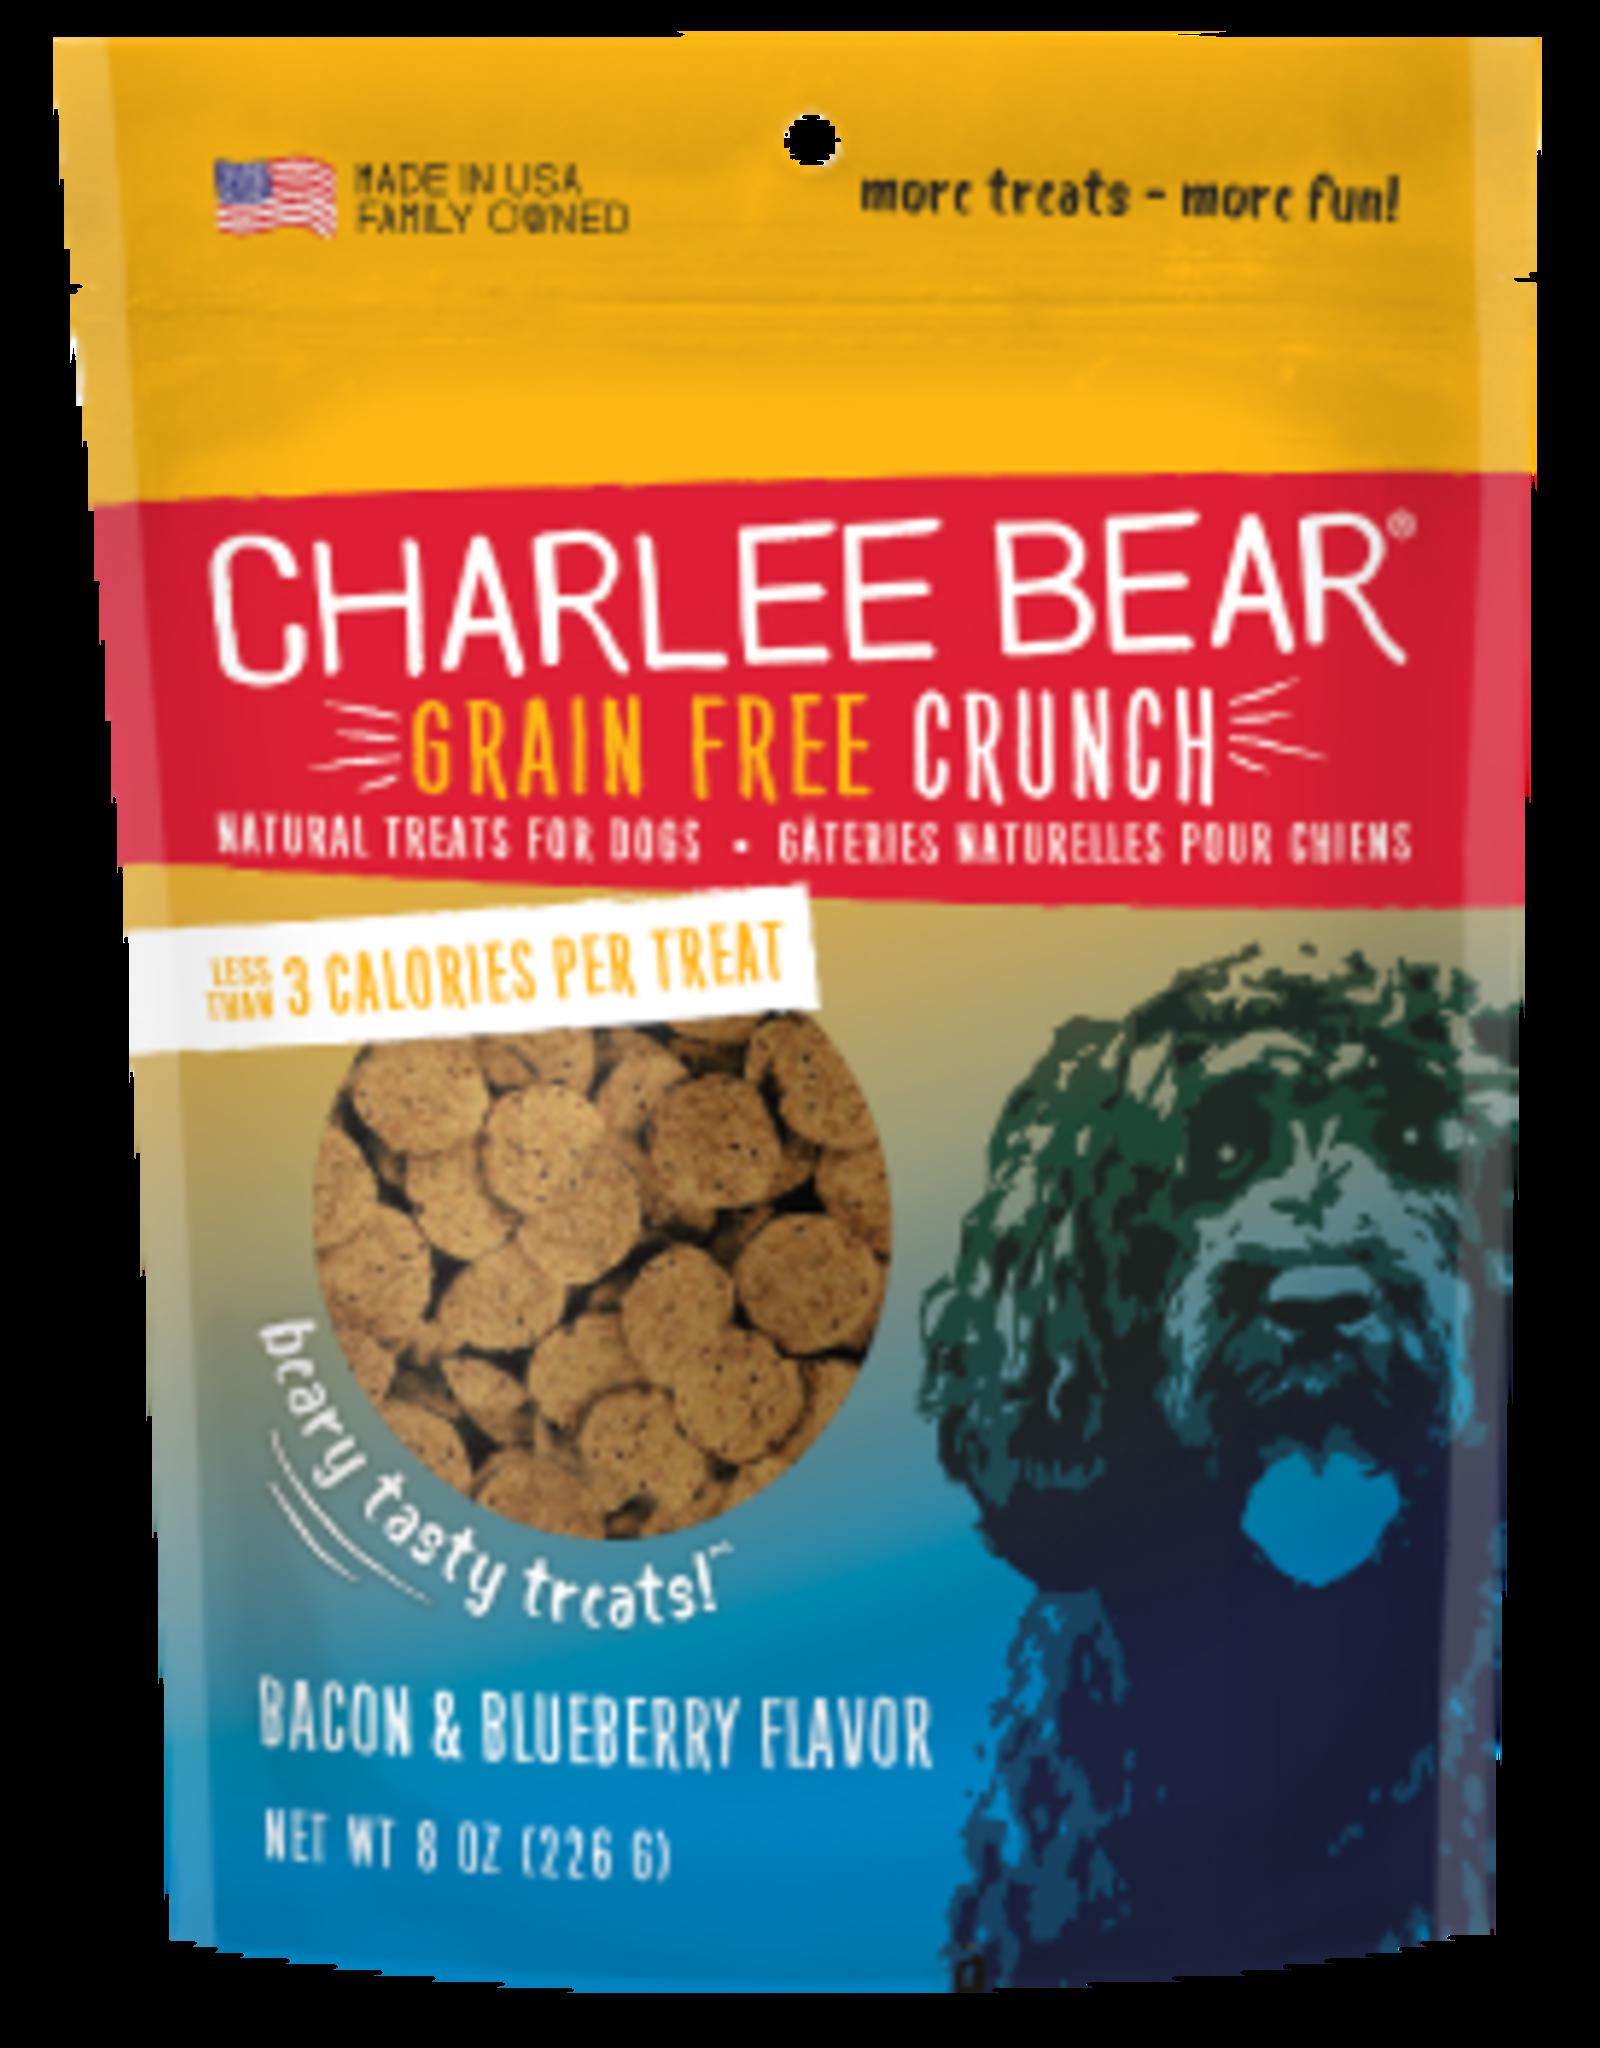 Charlee Bear Grain Free Crunch Bacon & Blueberry Flavor